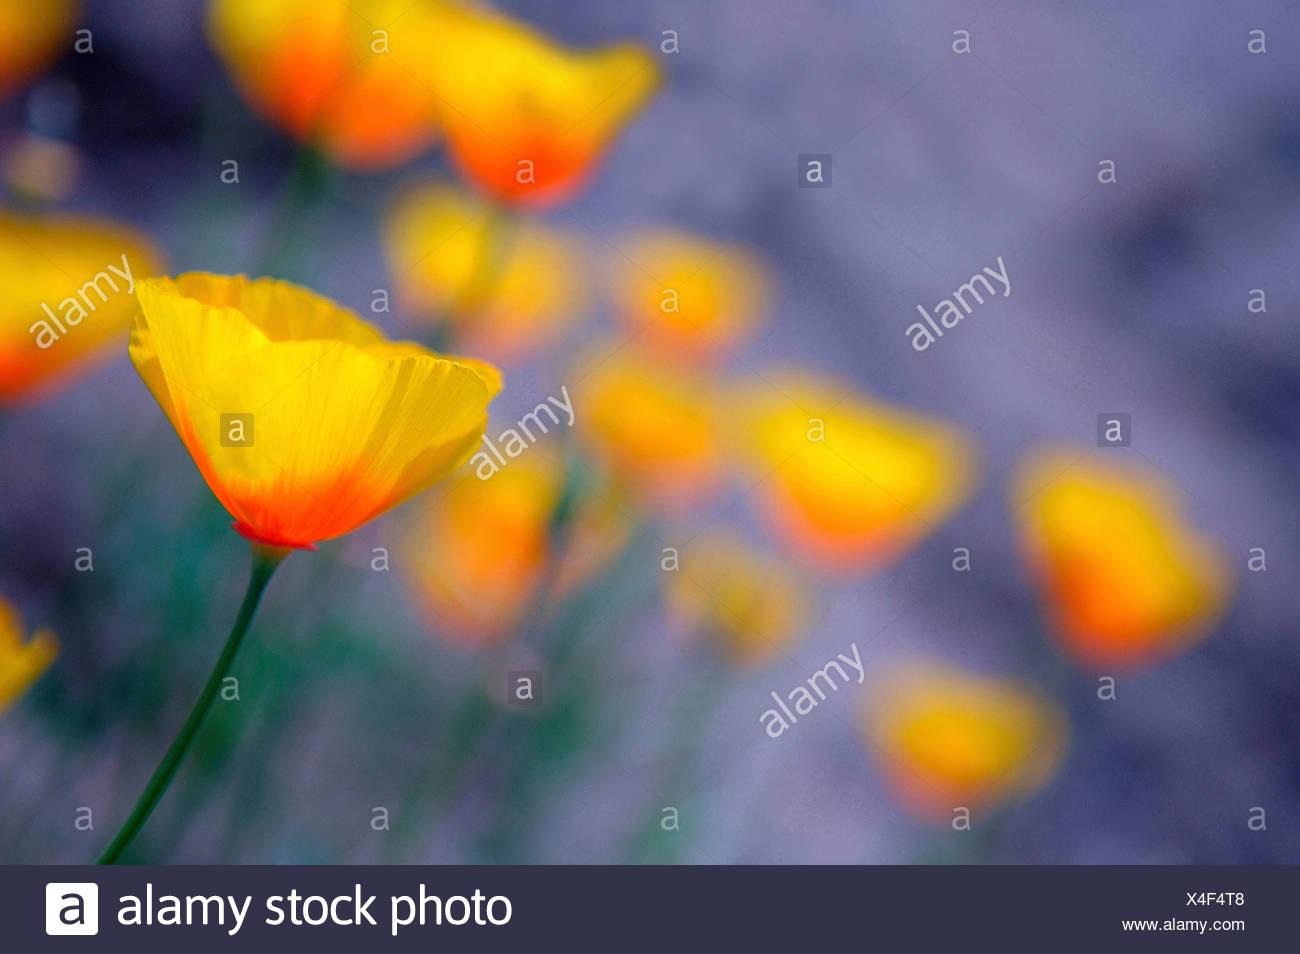 Wild Poppies, Papaver, Thousand Oaks, USA, California - Stock Image